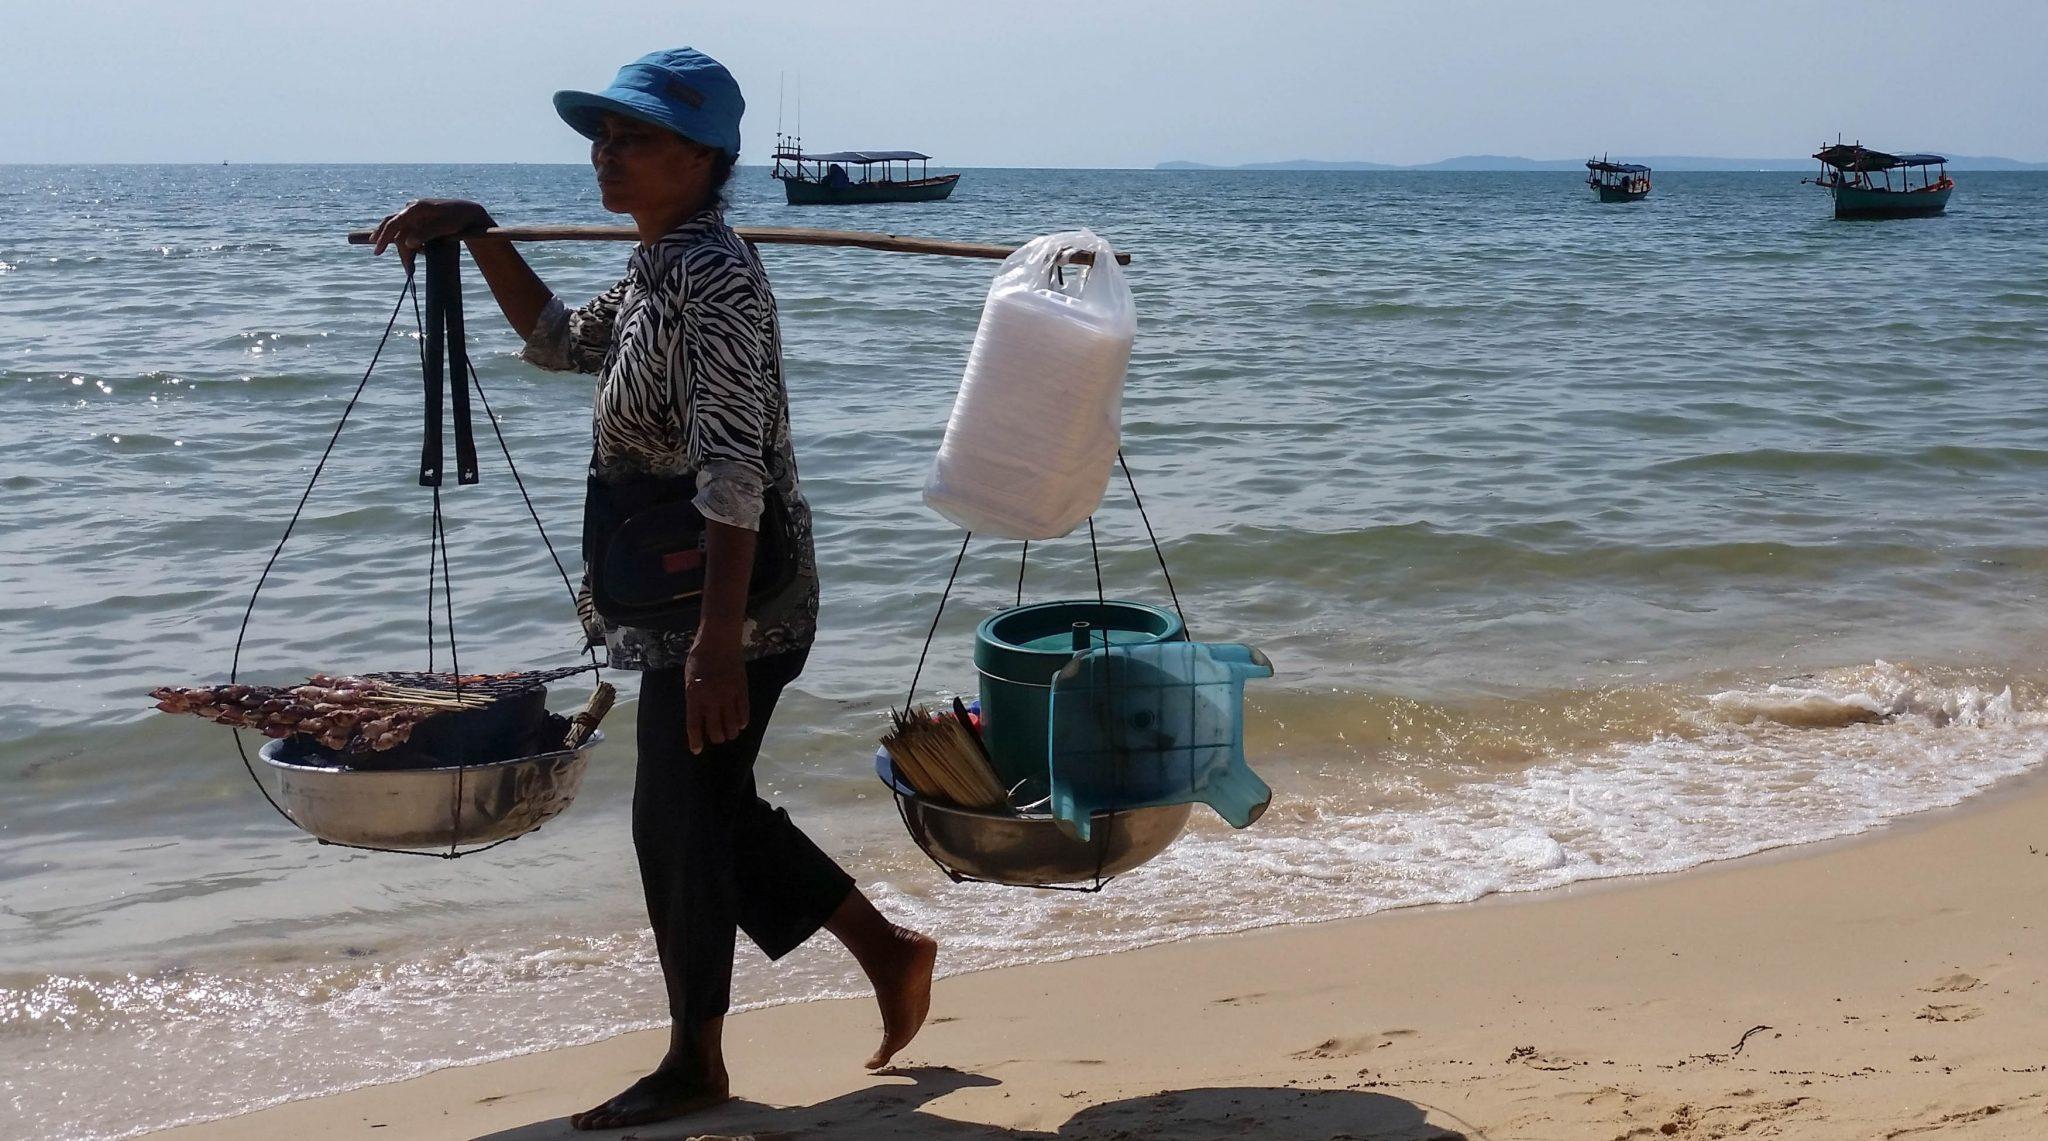 cambodia-asia-sihanoukville-sea-_PD